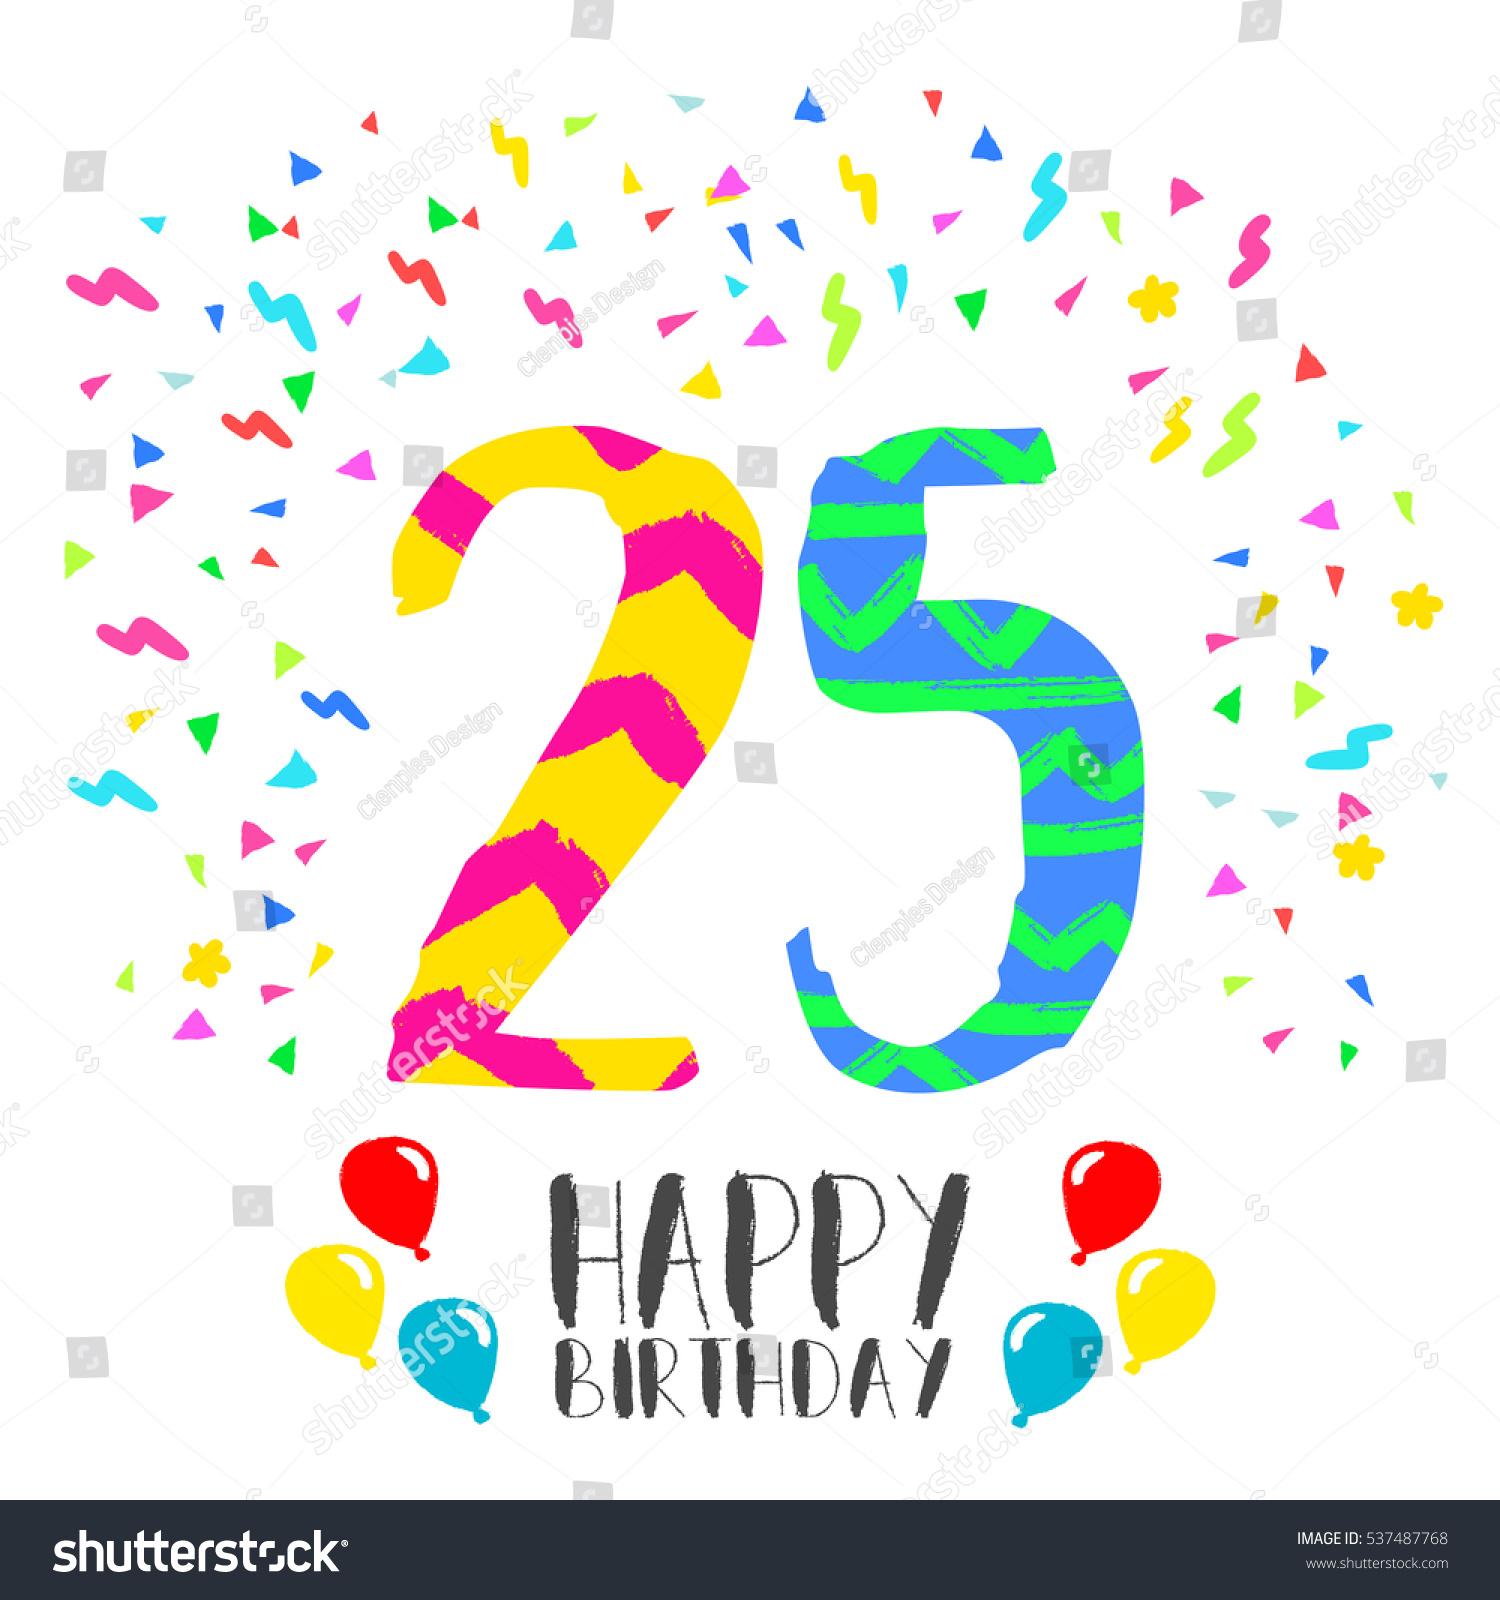 25 Birthday Cards Free Birthday Cards